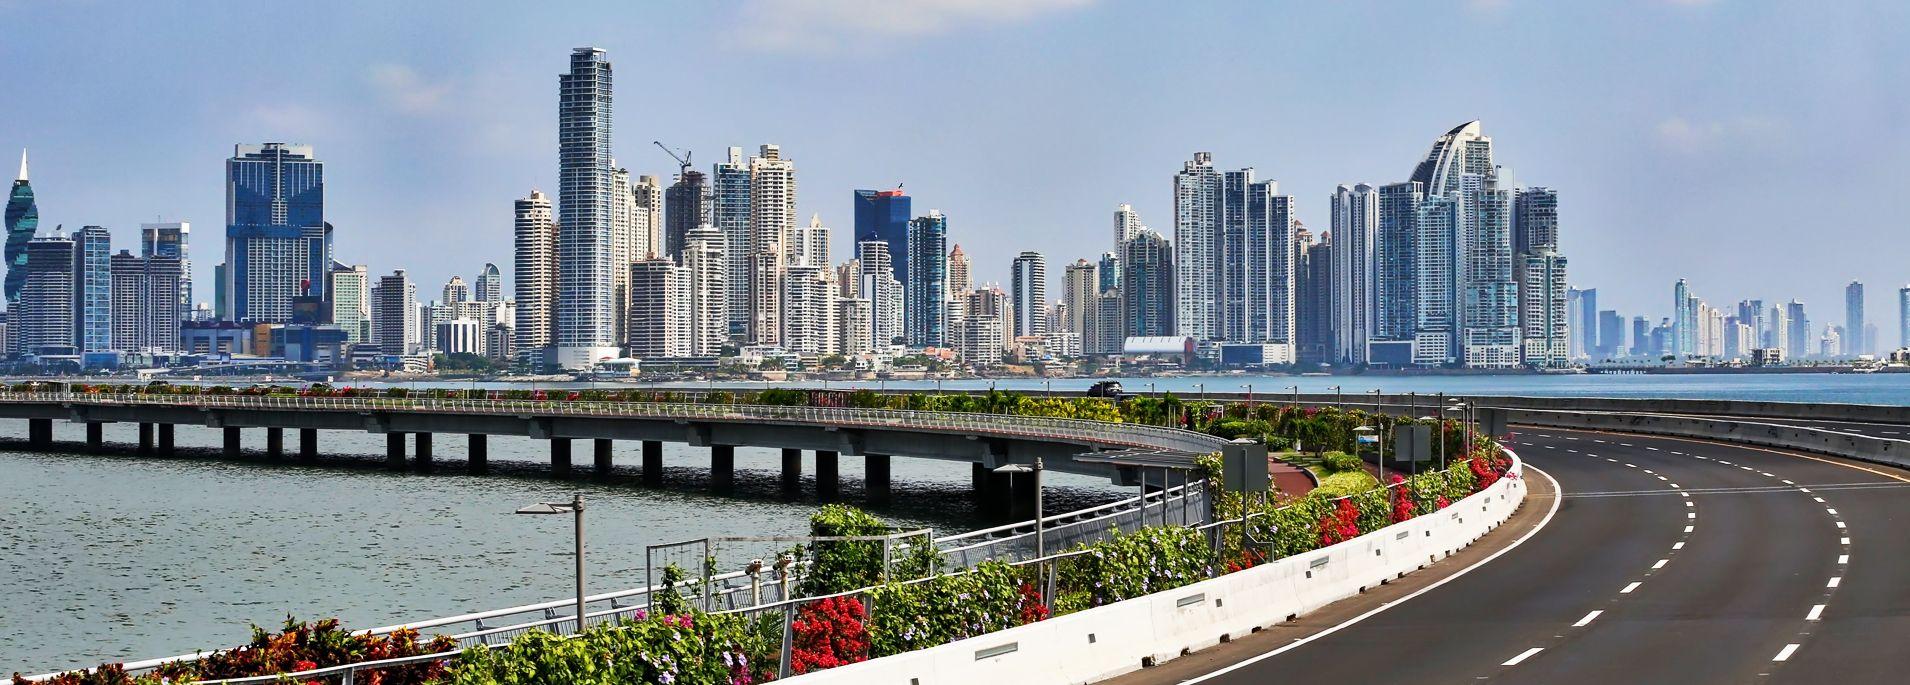 Panama City Dale Ventures Americas Region Offices